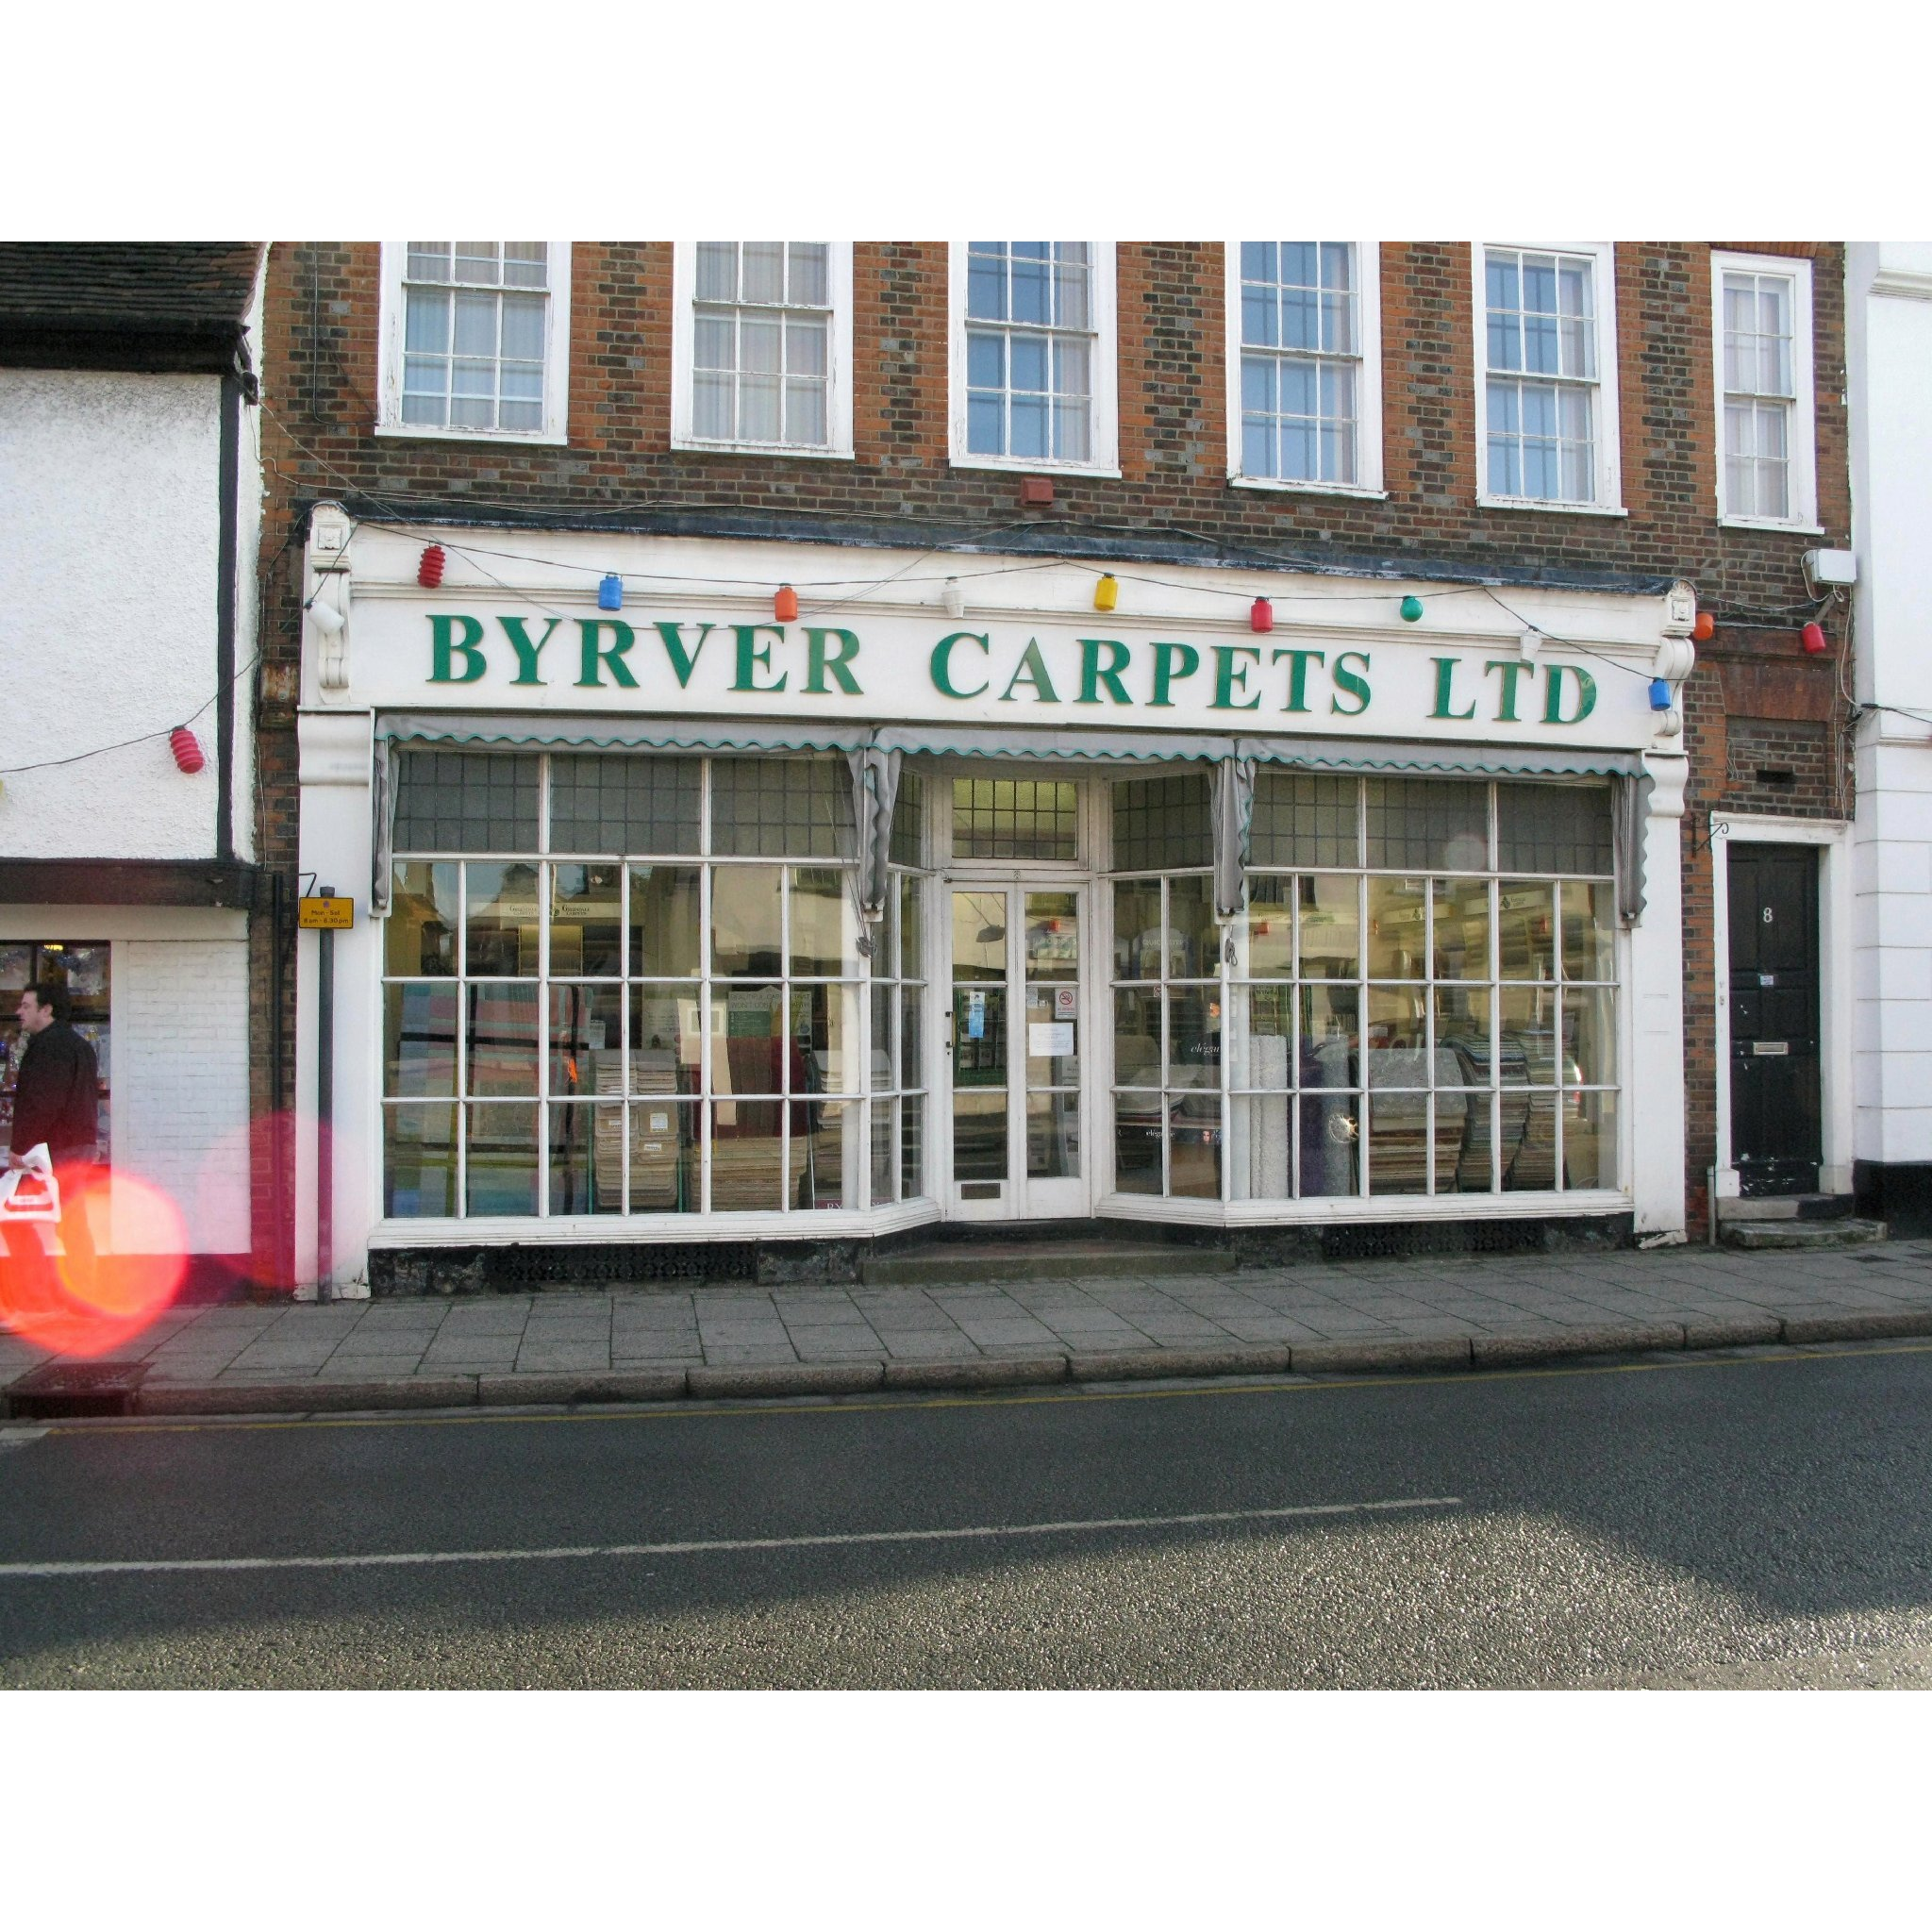 Byrver Flooring Ltd - Ware, Hertfordshire SG12 9DZ - 01920 461913 | ShowMeLocal.com